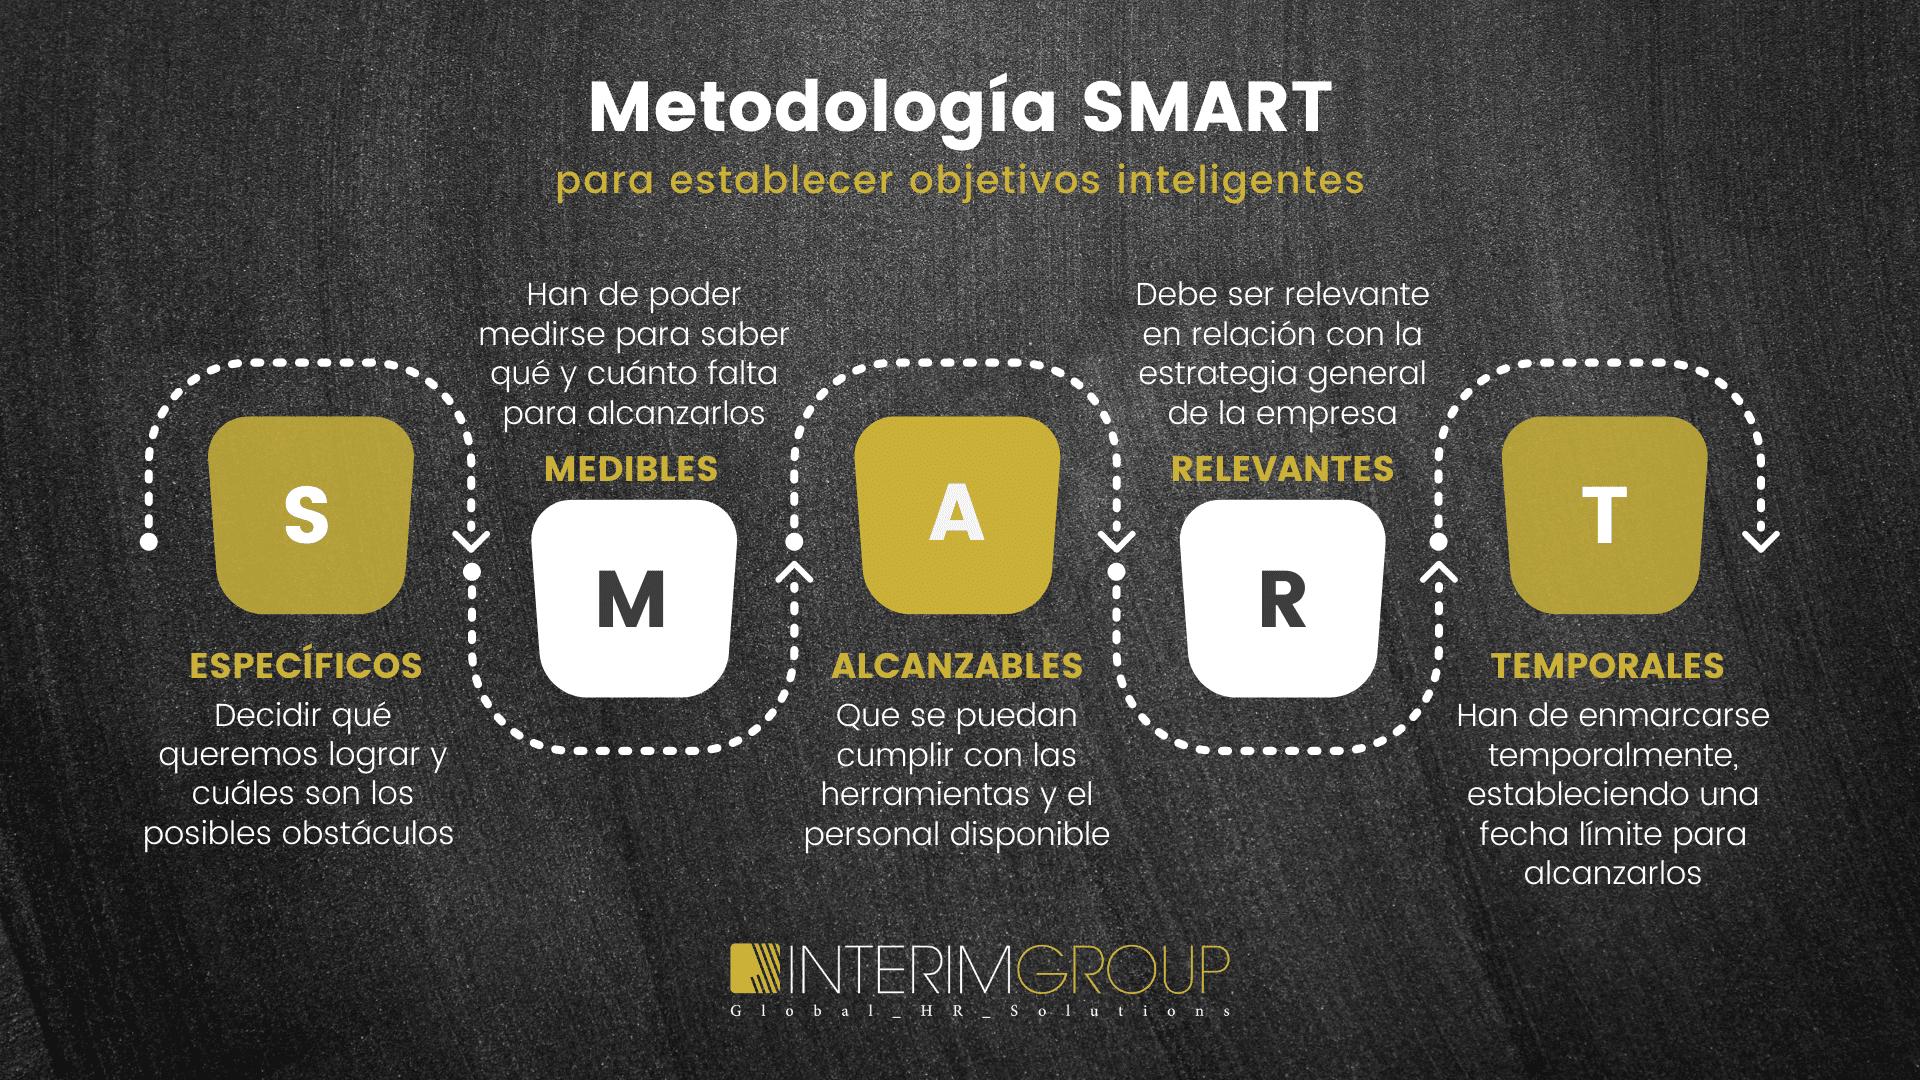 metodologia-SMART_INTERIM-GROUP